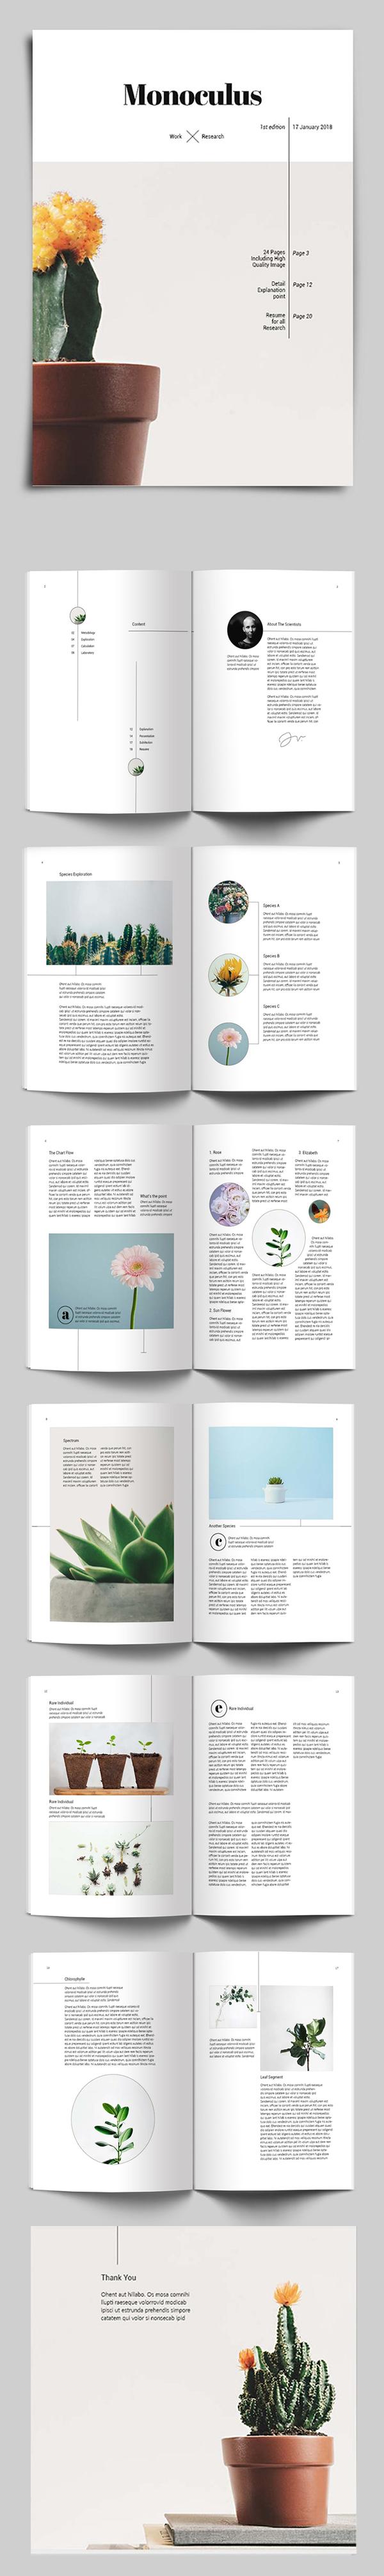 100 Professional Corporate Brochure Templates - 42